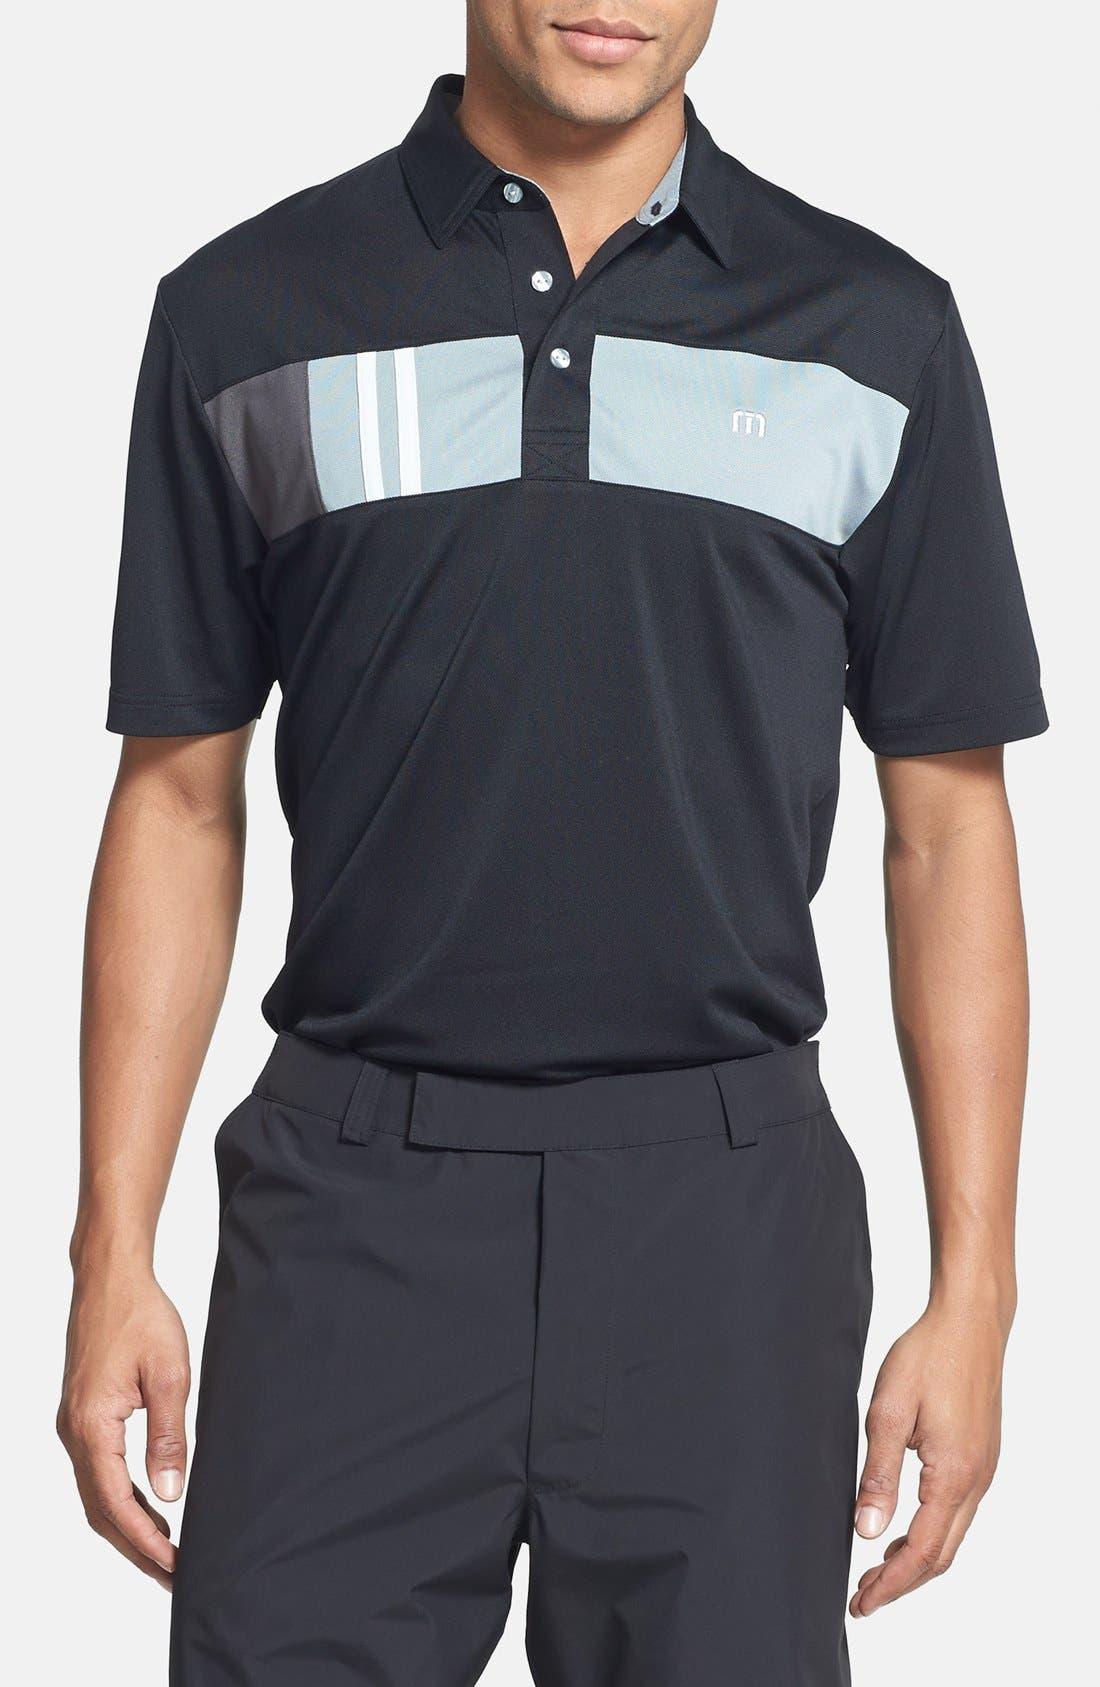 Main Image - Travis Mathew 'Kloss' Trim Fit Golf Polo